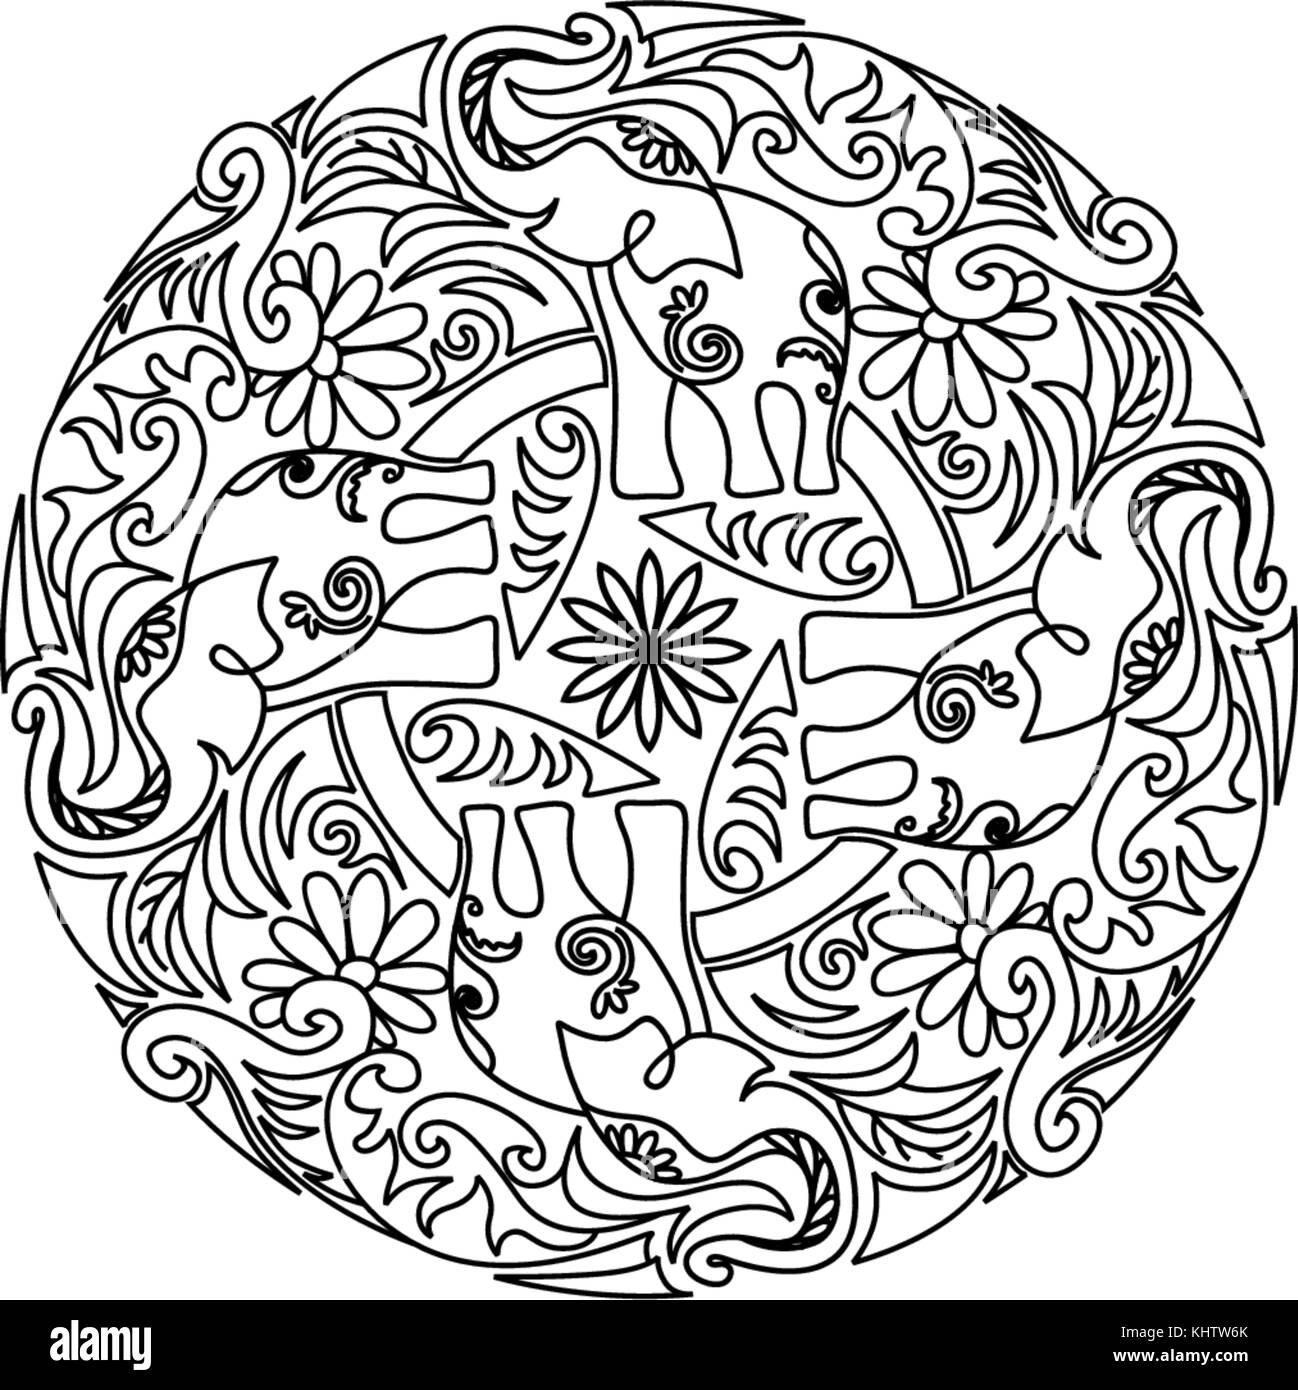 Mandala elephant design. Decorative pattern. Coloring book page ...